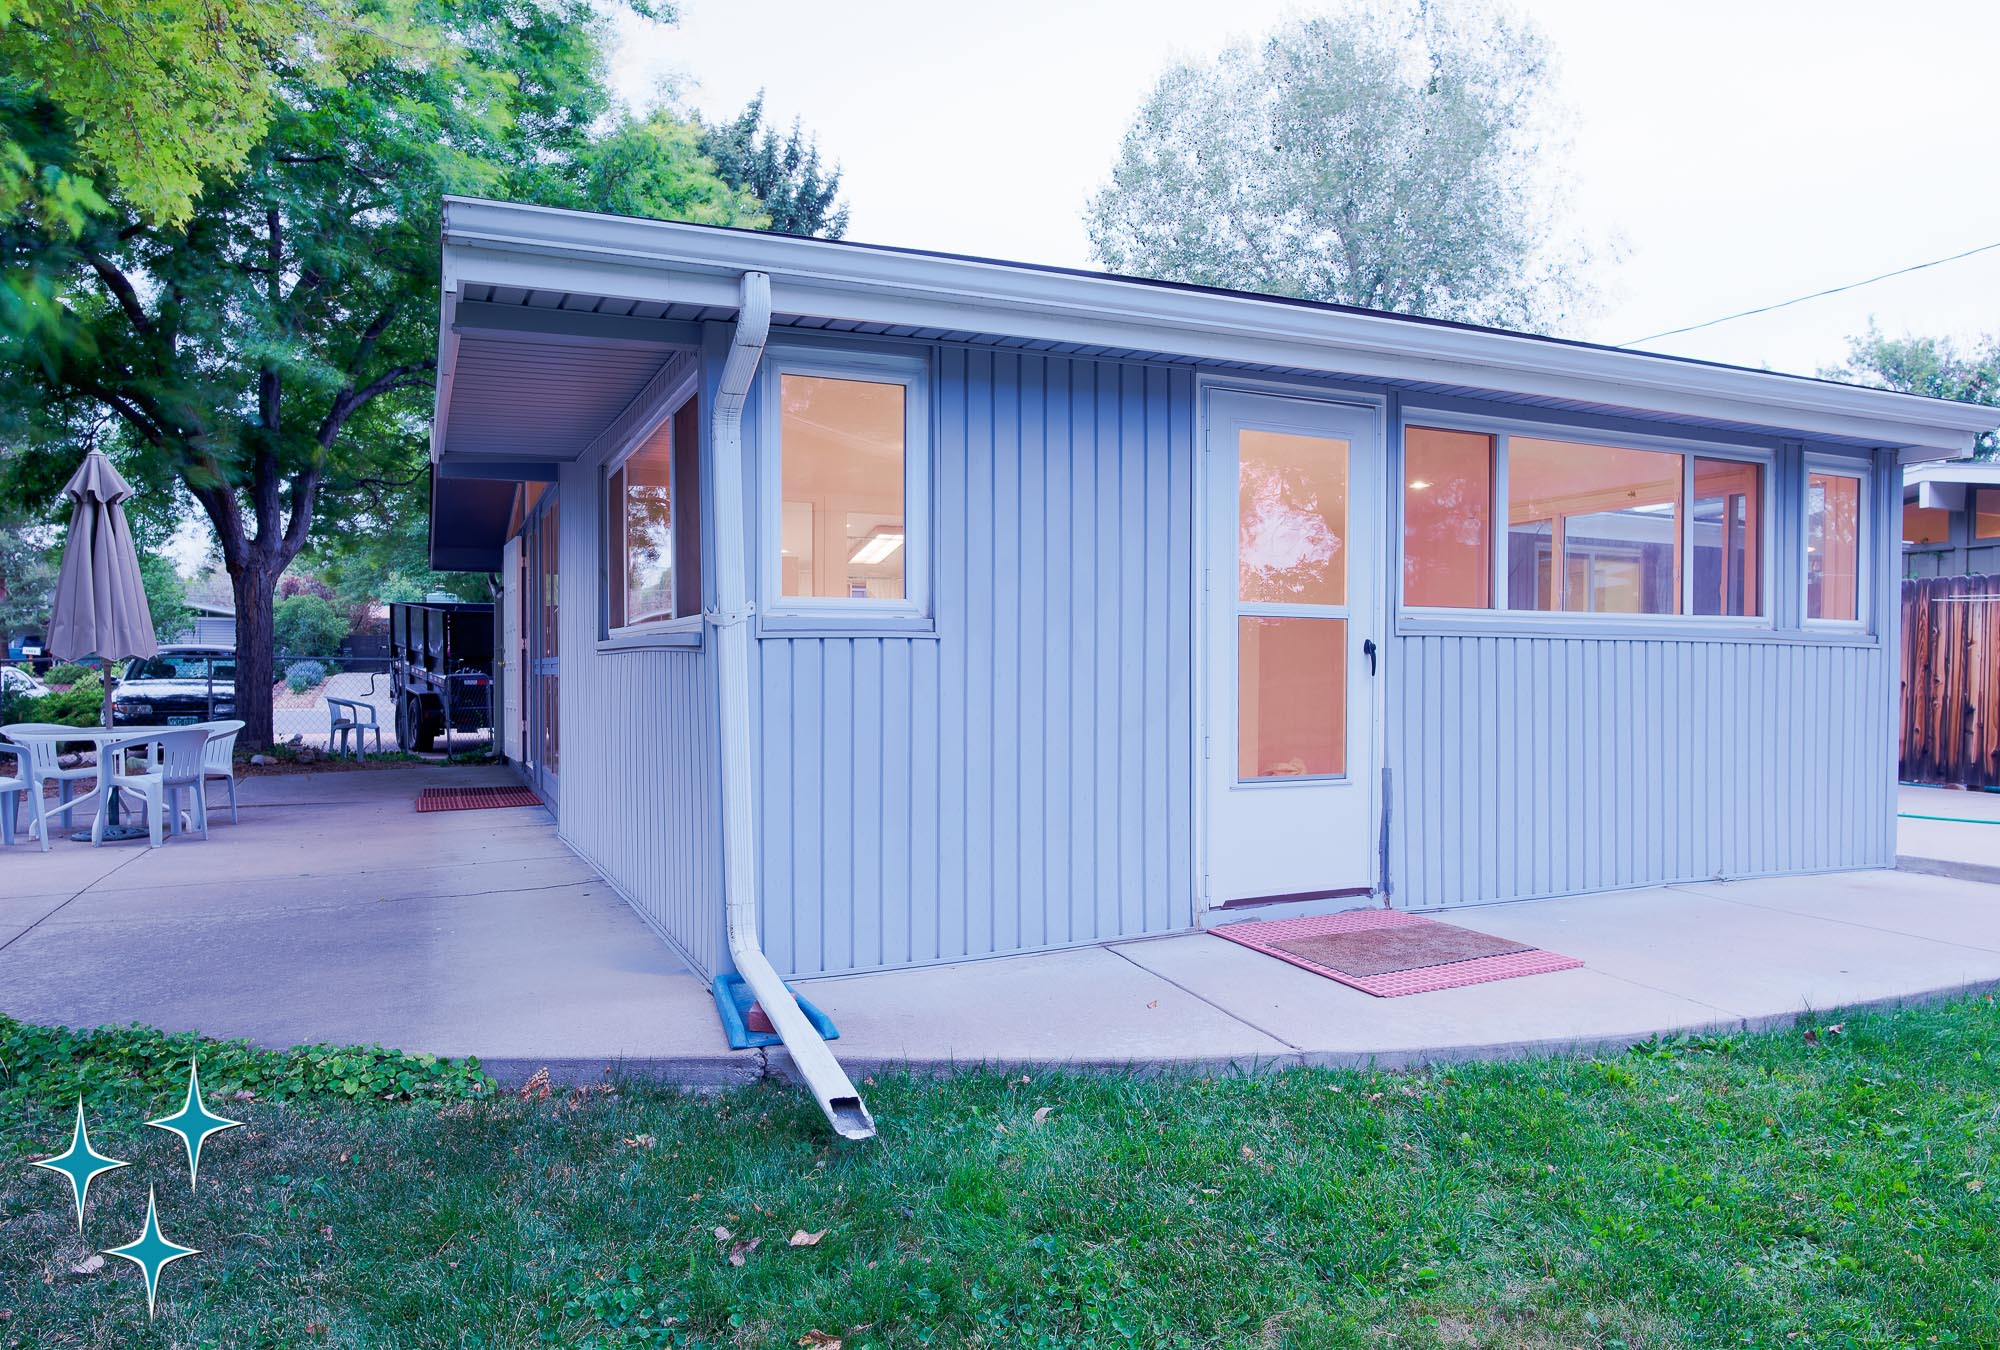 Adrian-Kinney-2360-S-Newton-Street-Denver-Cliff-May-Harvey-Park-2000w50-3SWM--8.jpg